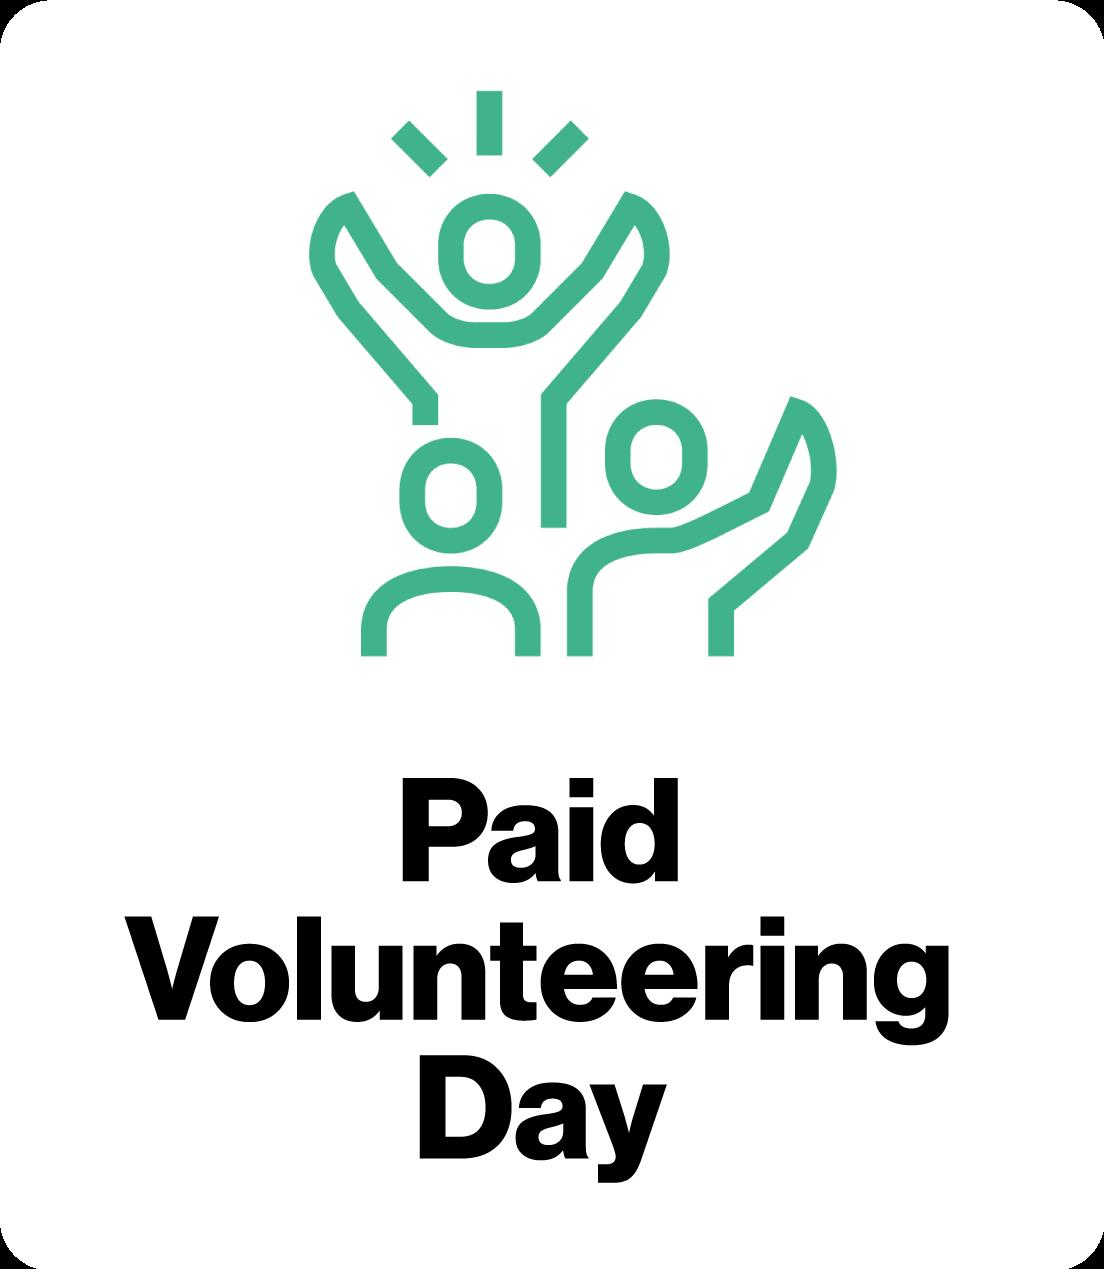 Paid Volunteering Day